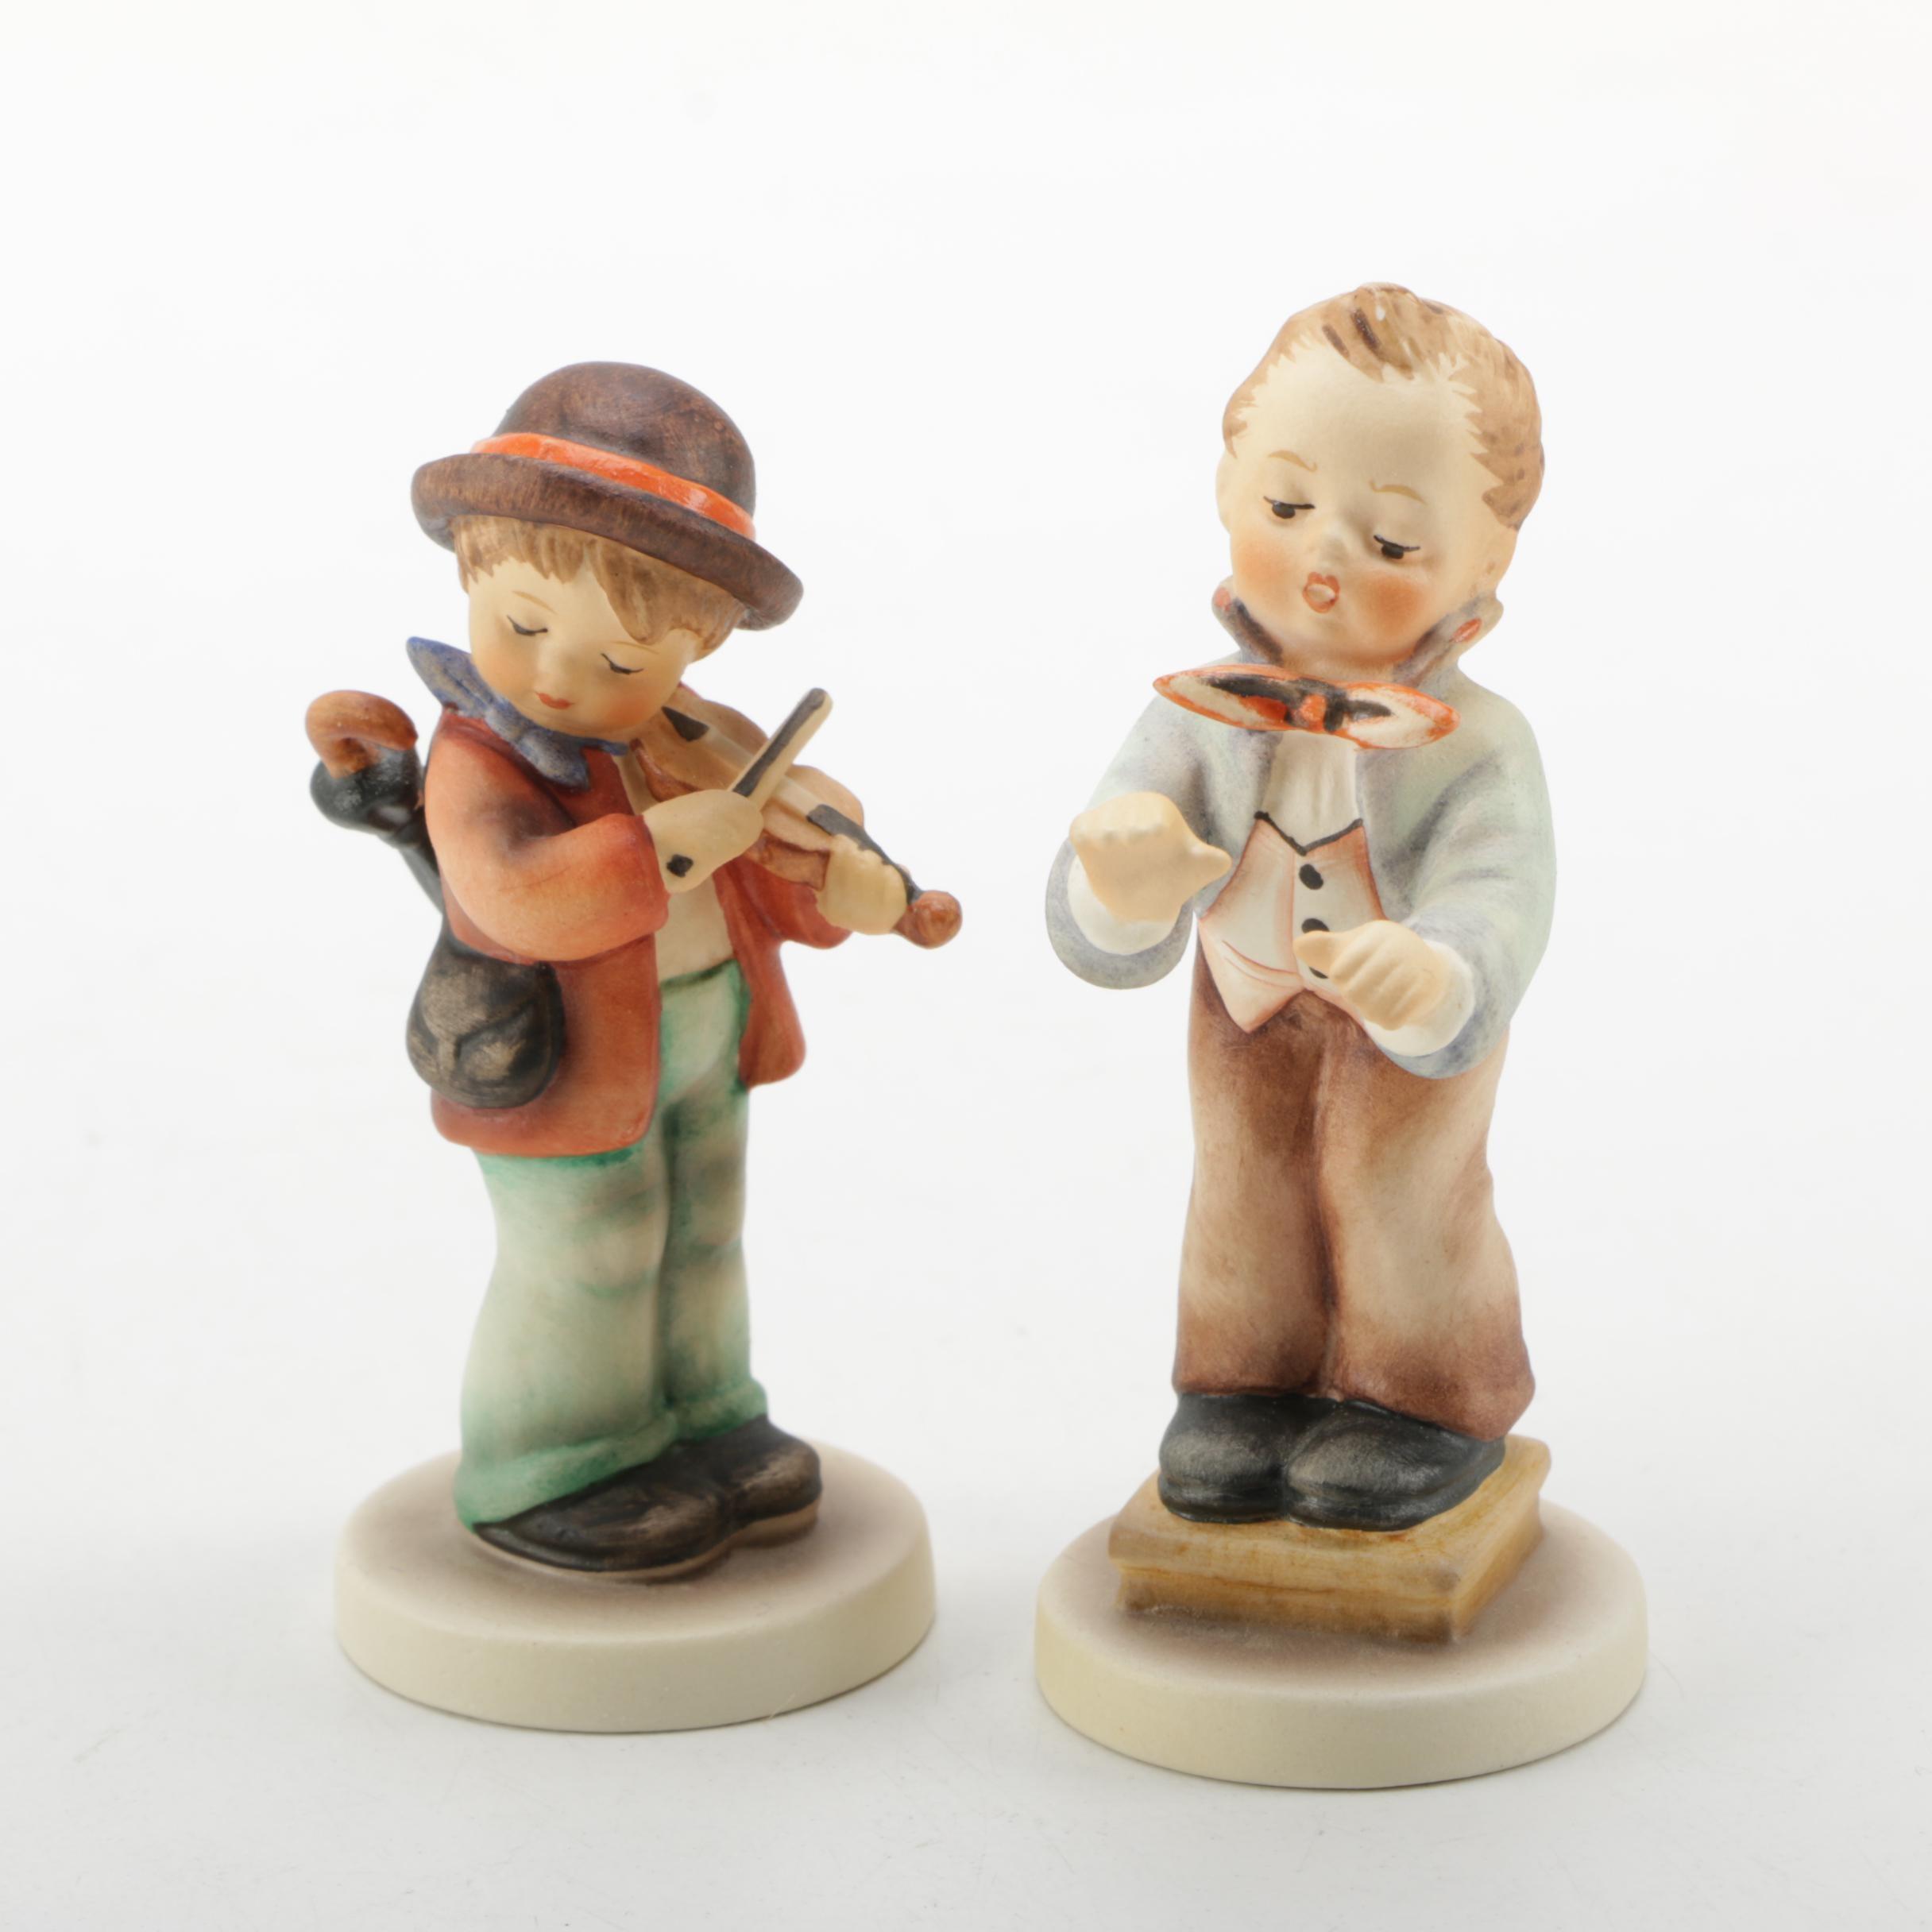 Pair of Vintage Hummel Figurines